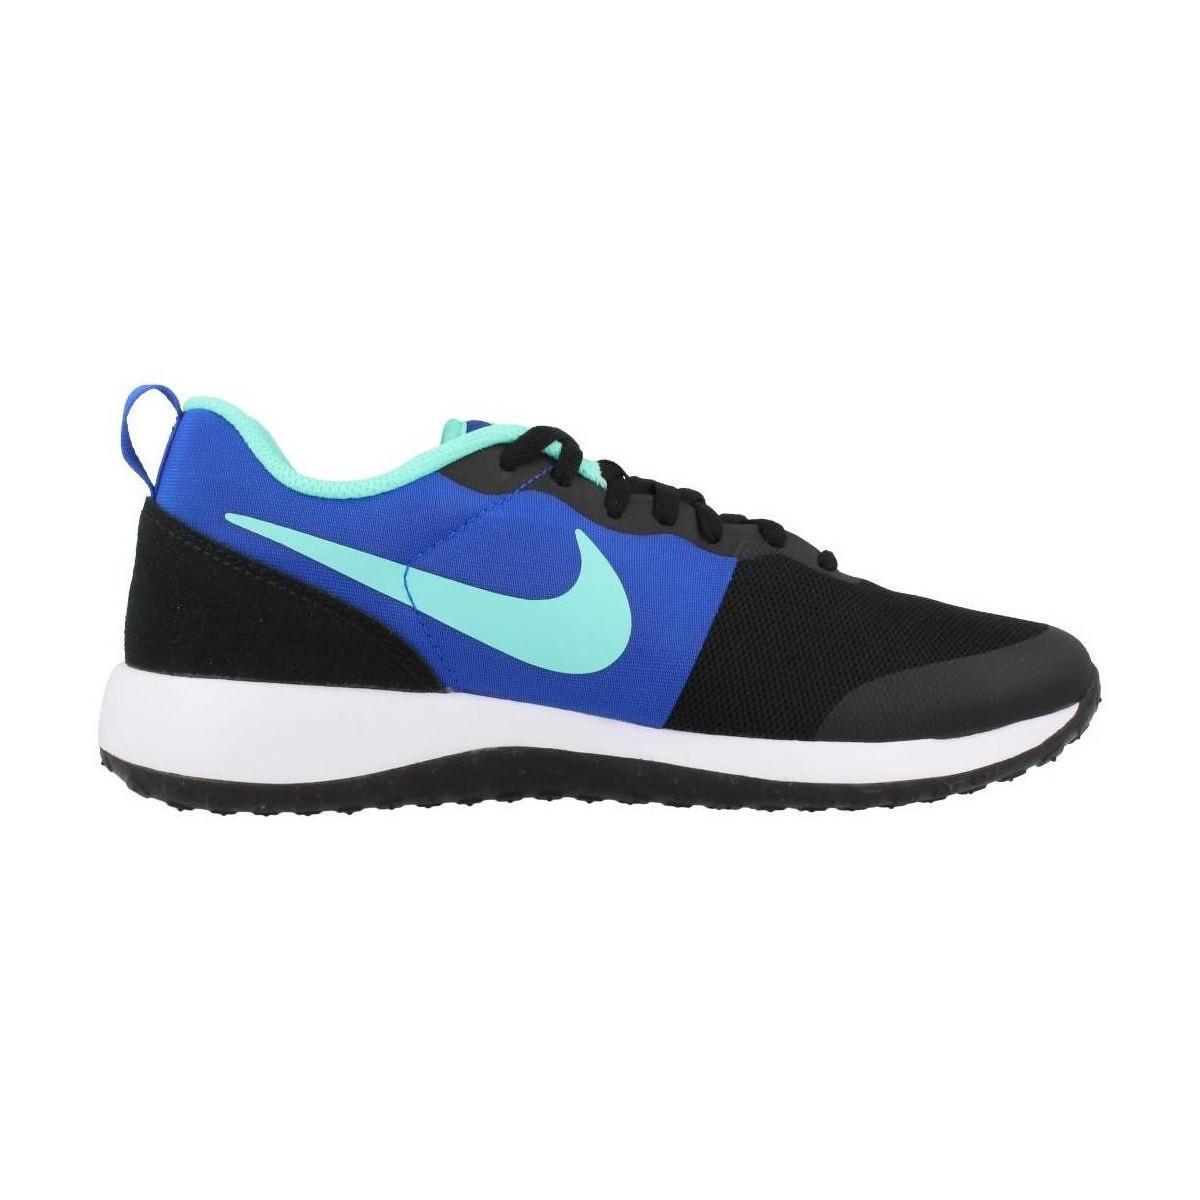 Nike Elite Shinsen Women's Shoes (trainers) In Blue